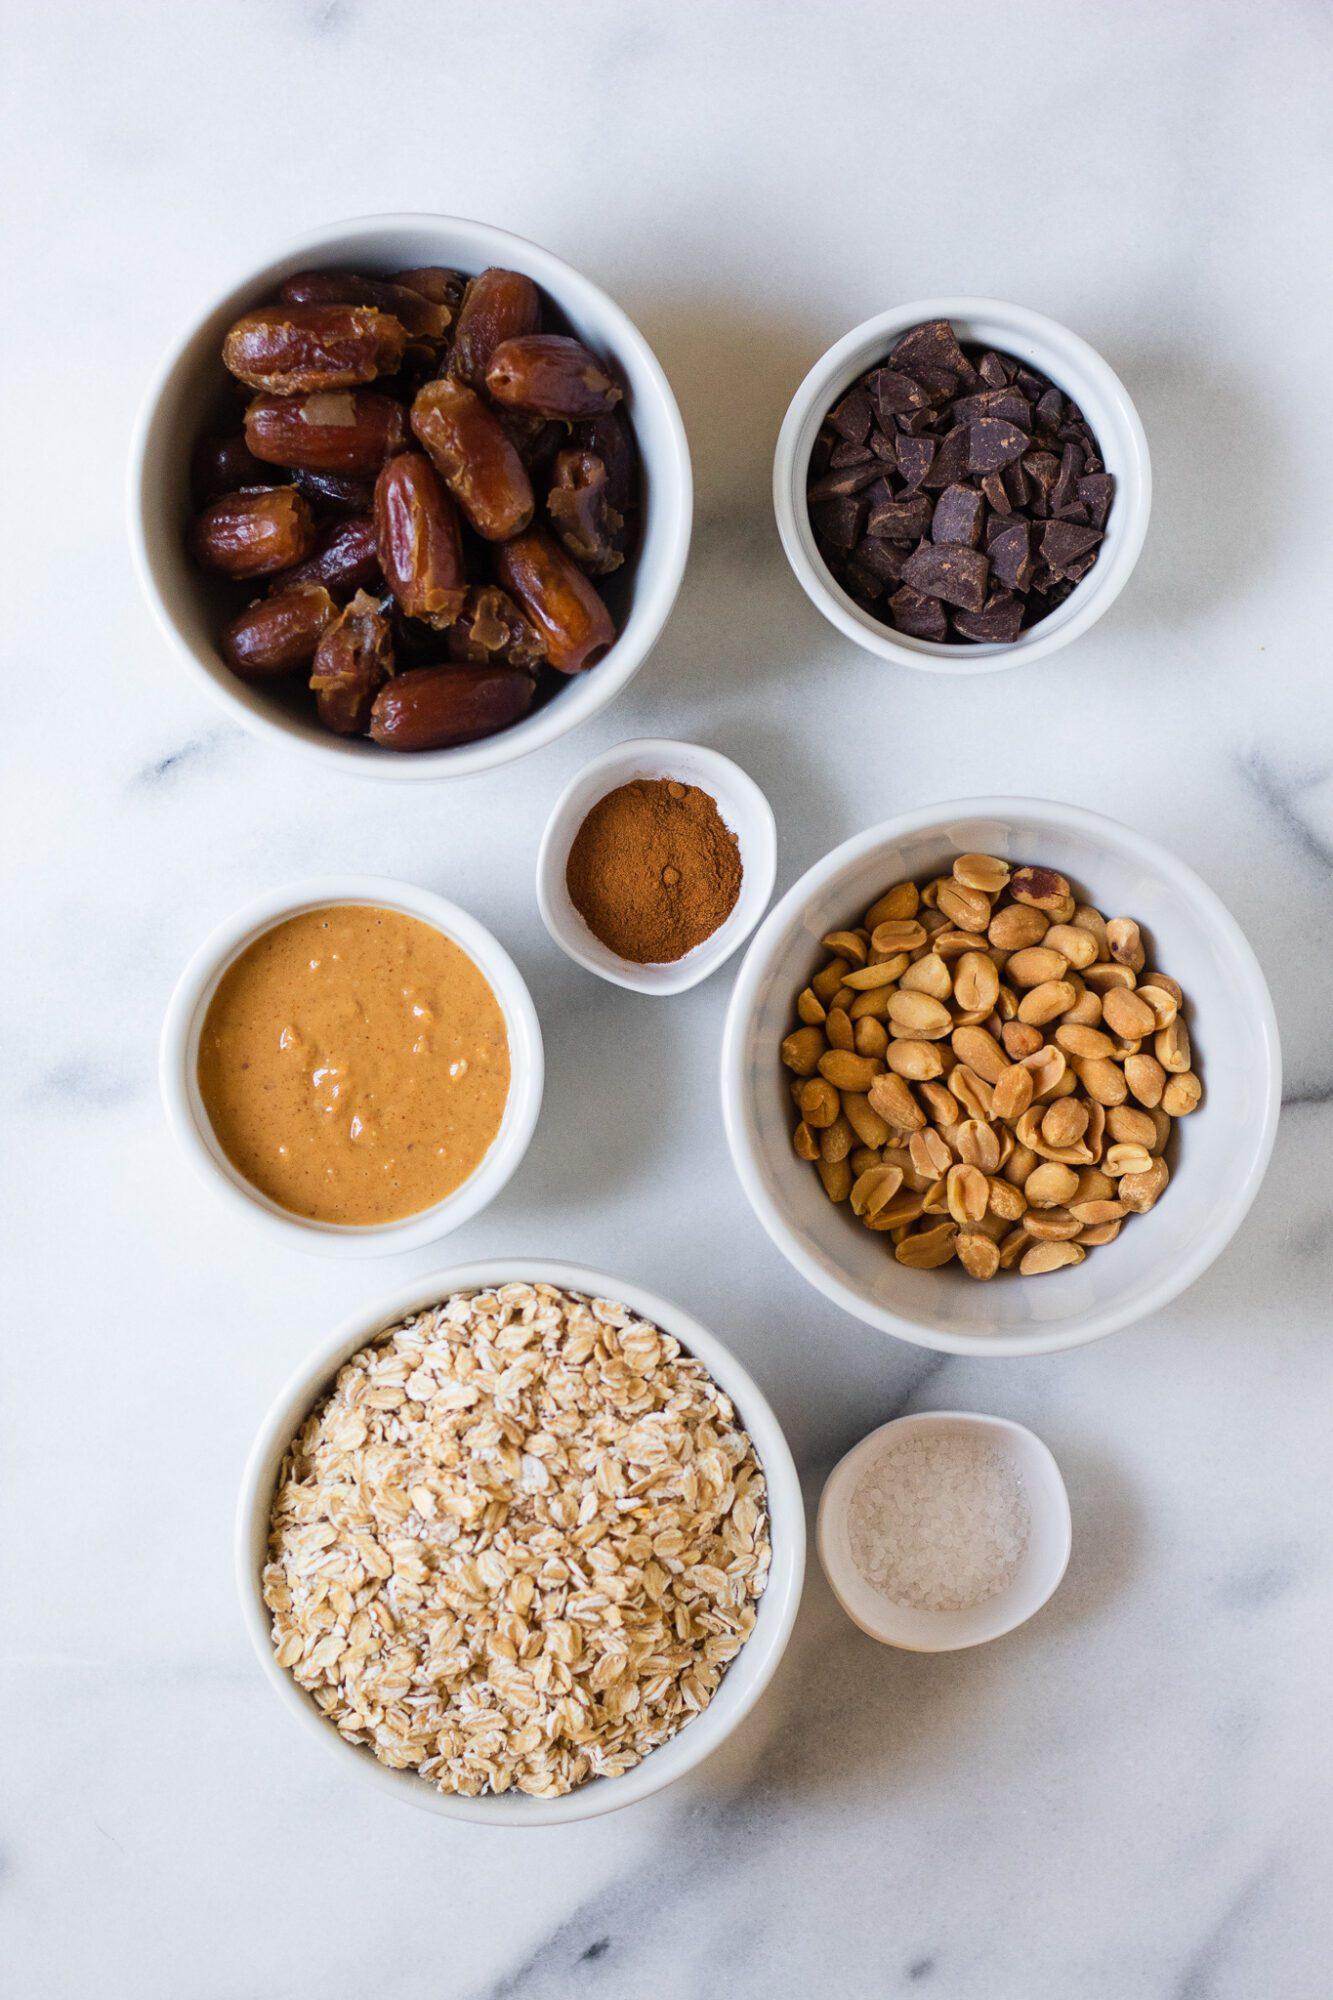 ingredients for easy granola bars